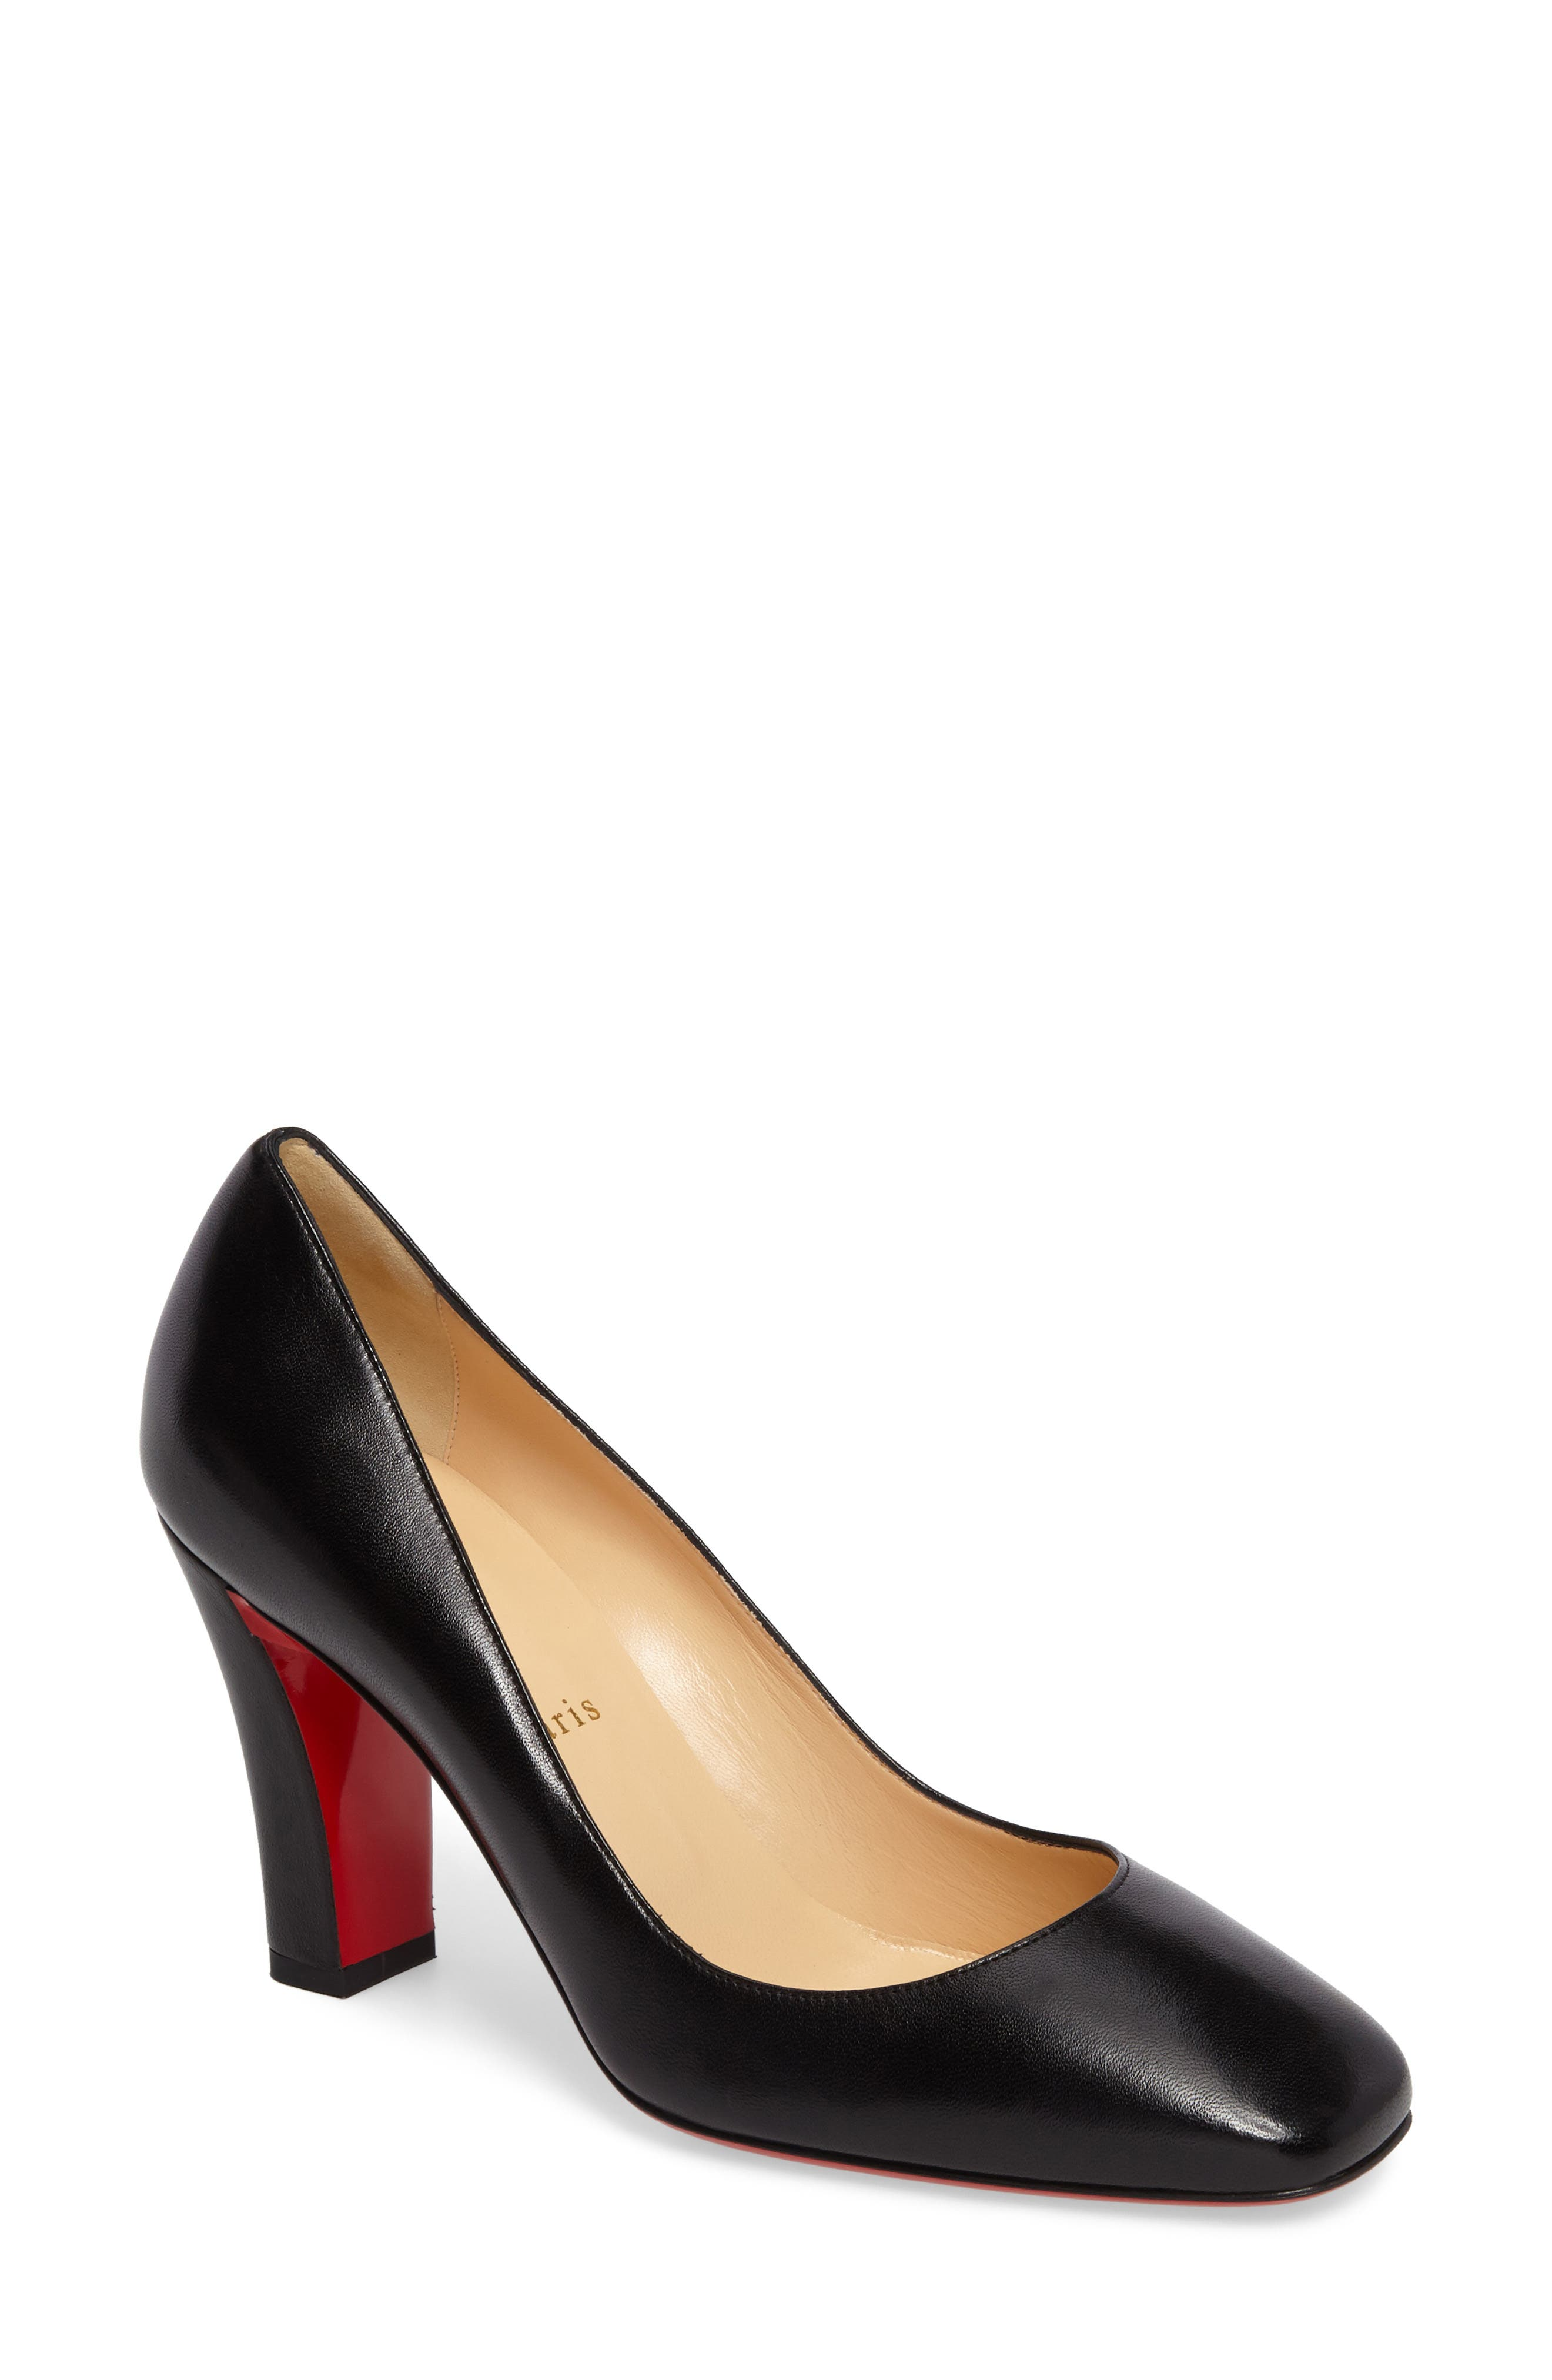 christian louboutin kitten heel shoes